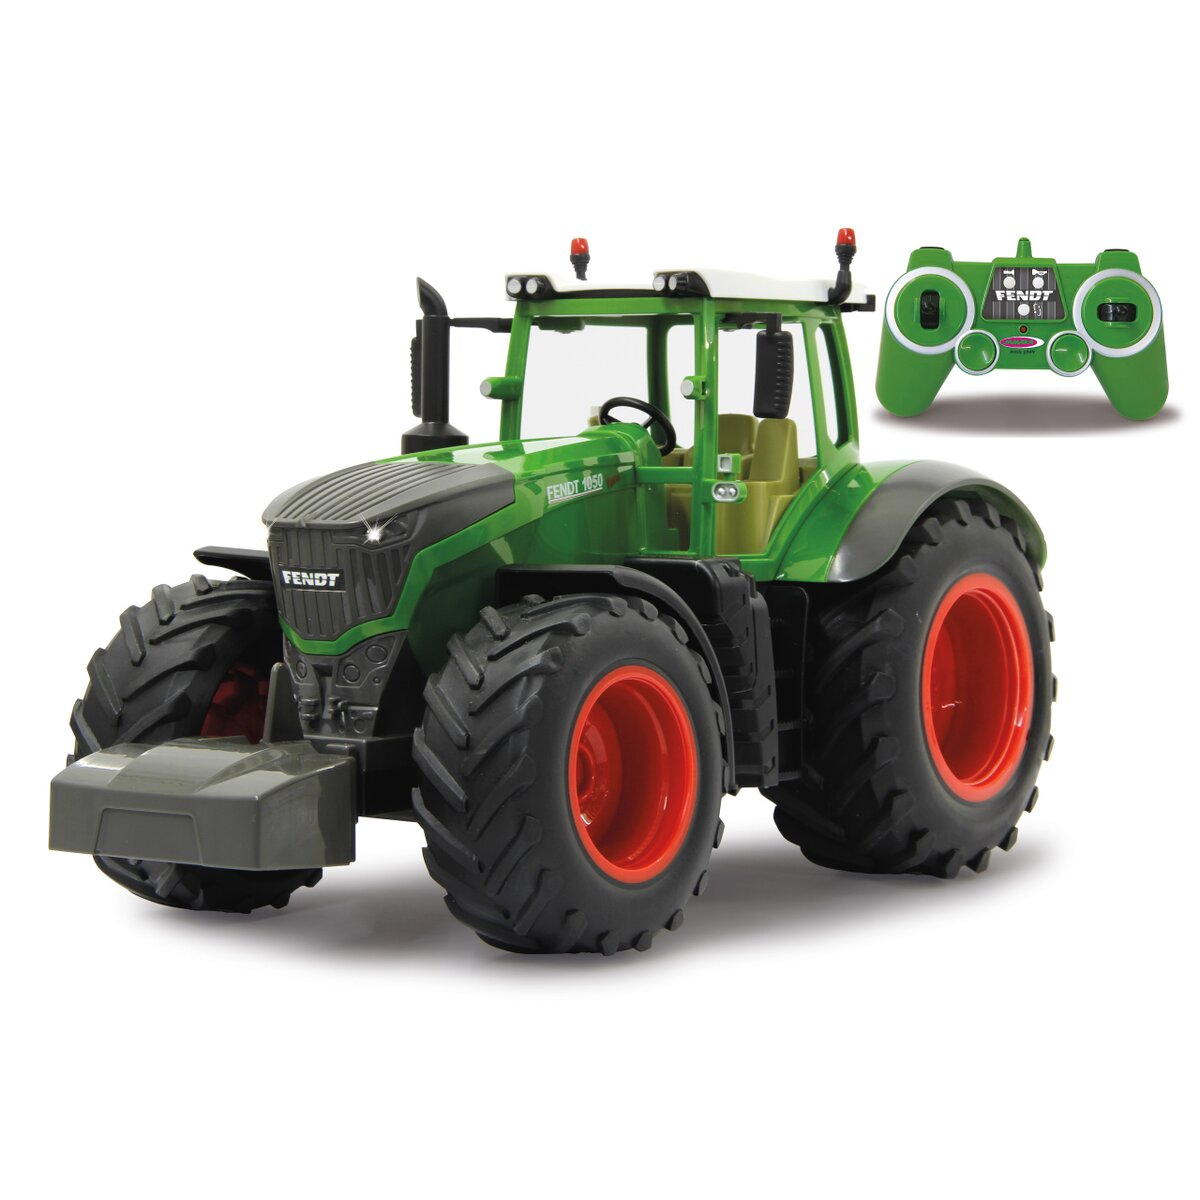 Jamara traktor Fendt 1050 Vario